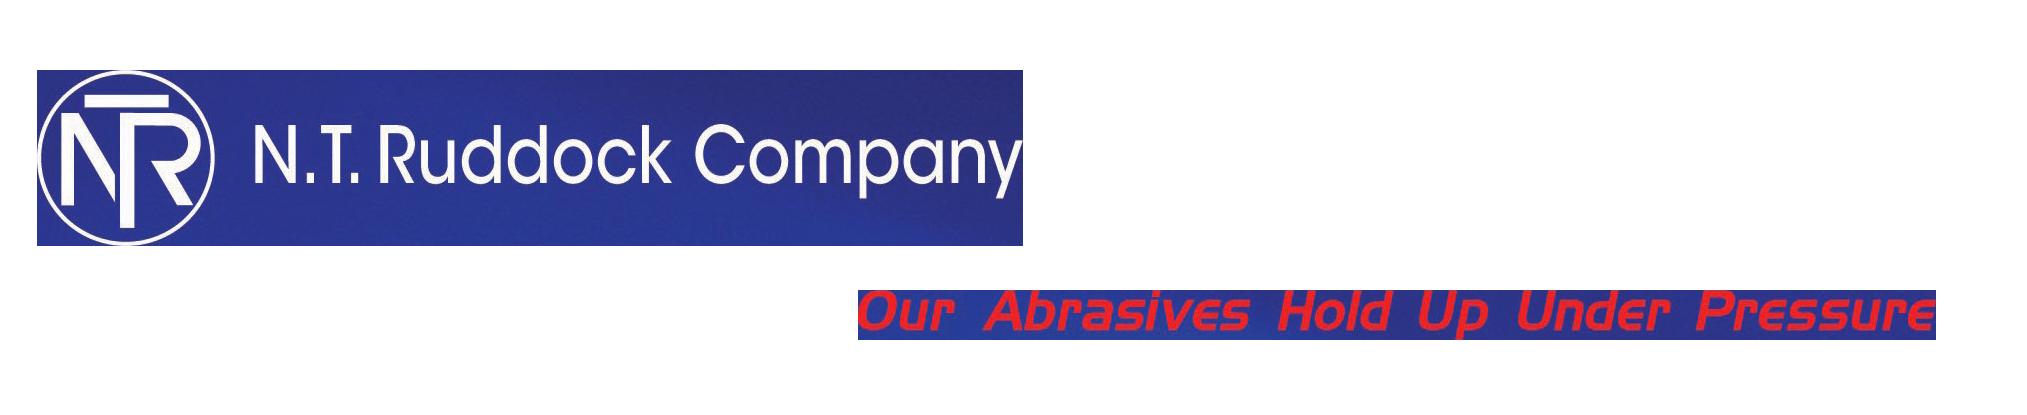 Our abrasives hold up under pressure